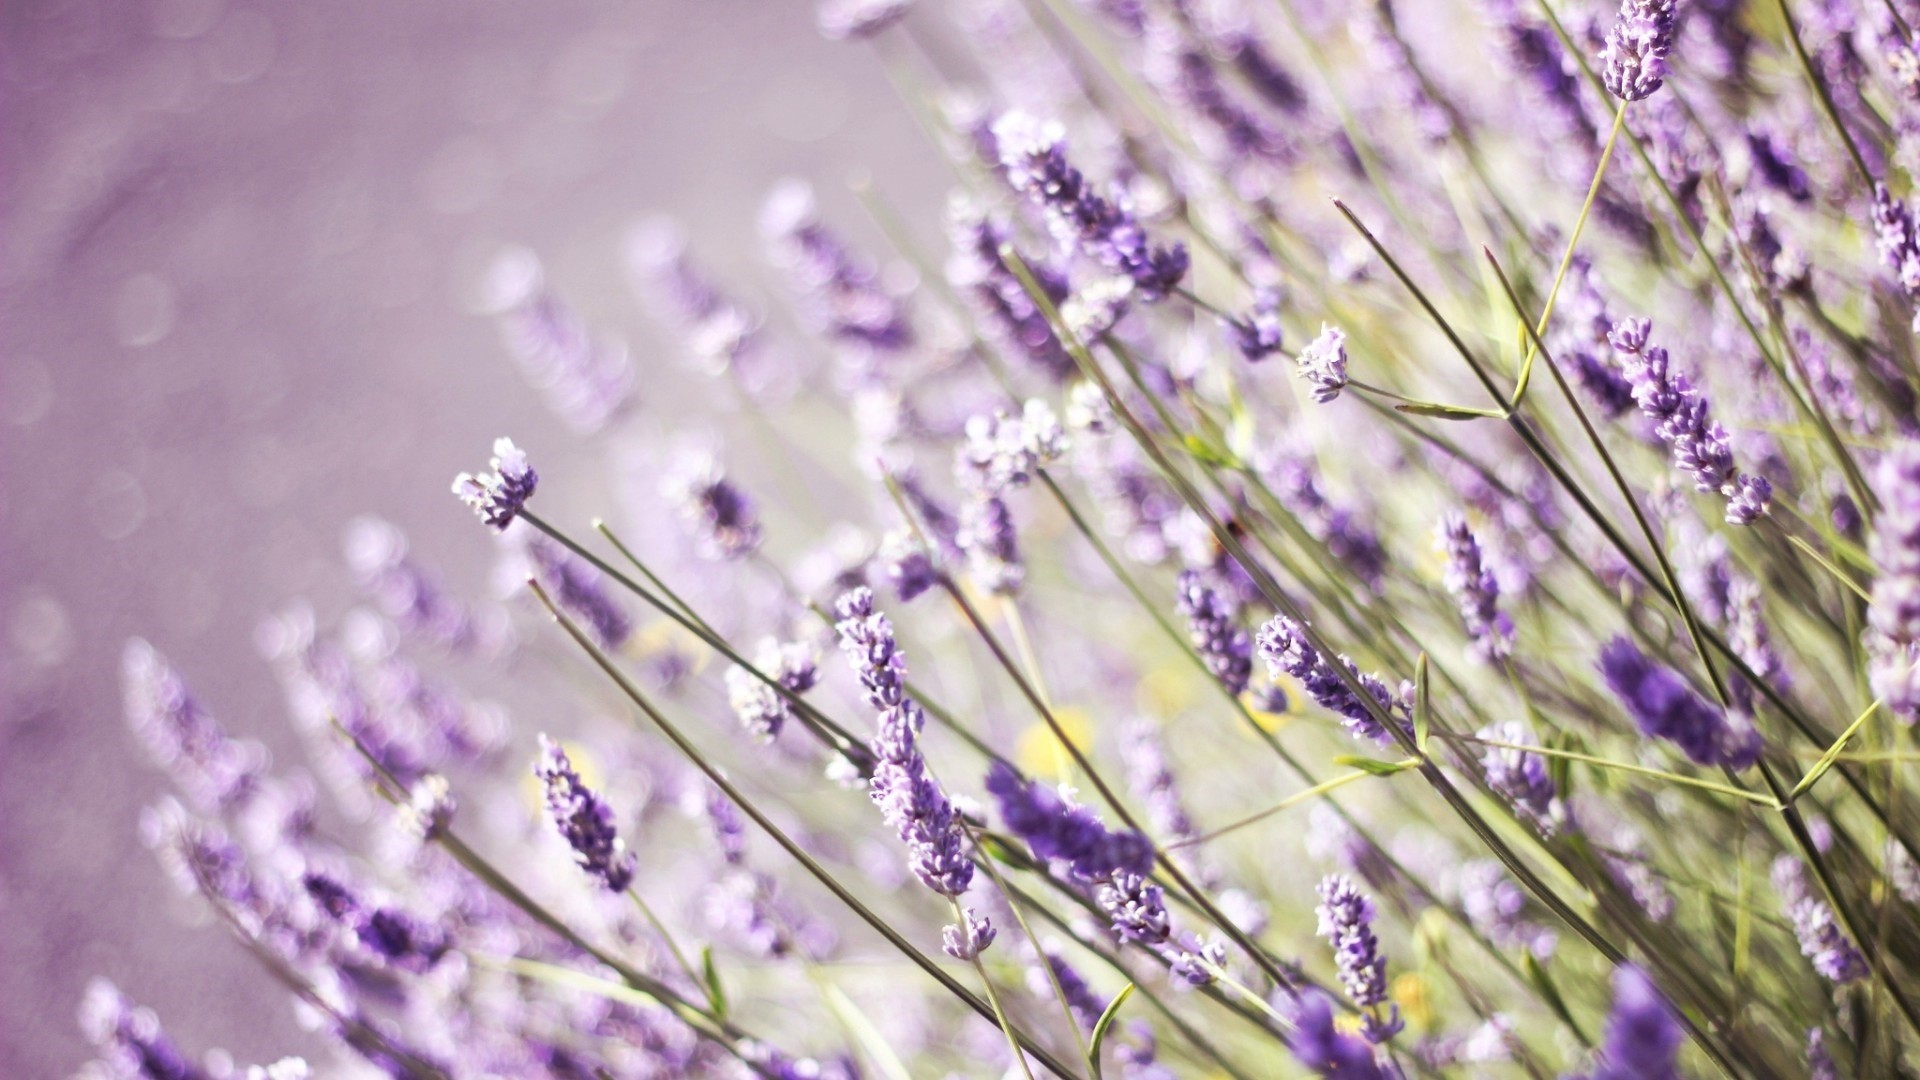 Lavender PC Wallpaper